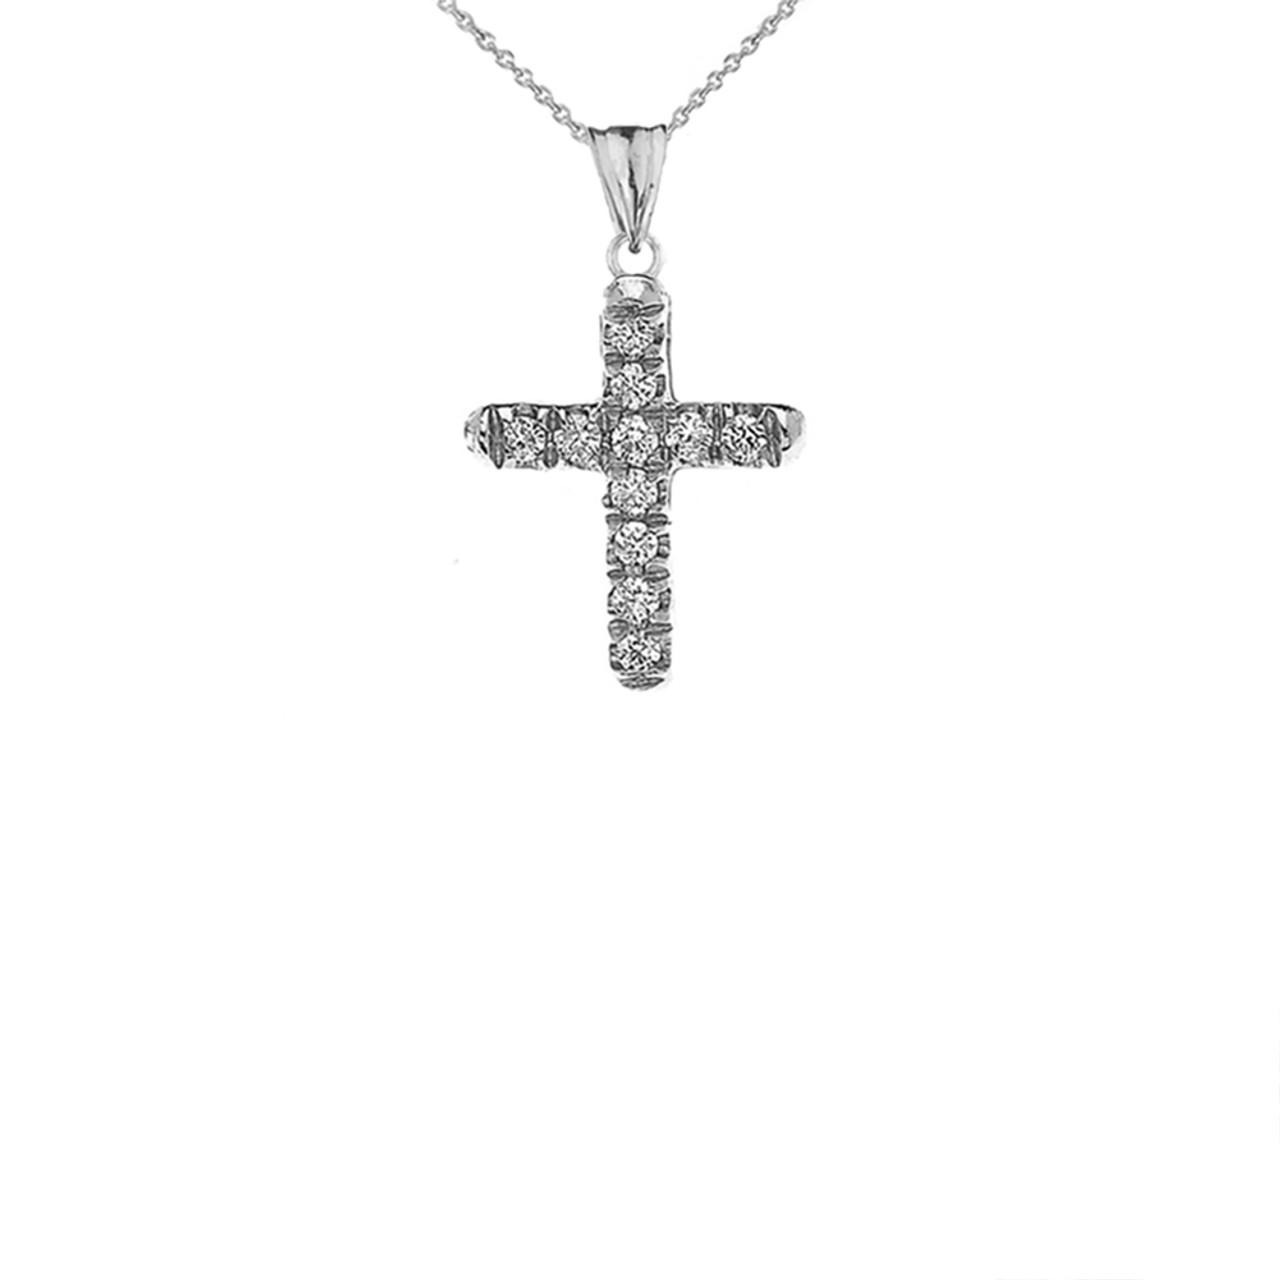 17be72ad5 Details about 14k White Gold Mini Elegant Diamond Cross Pendant Necklace